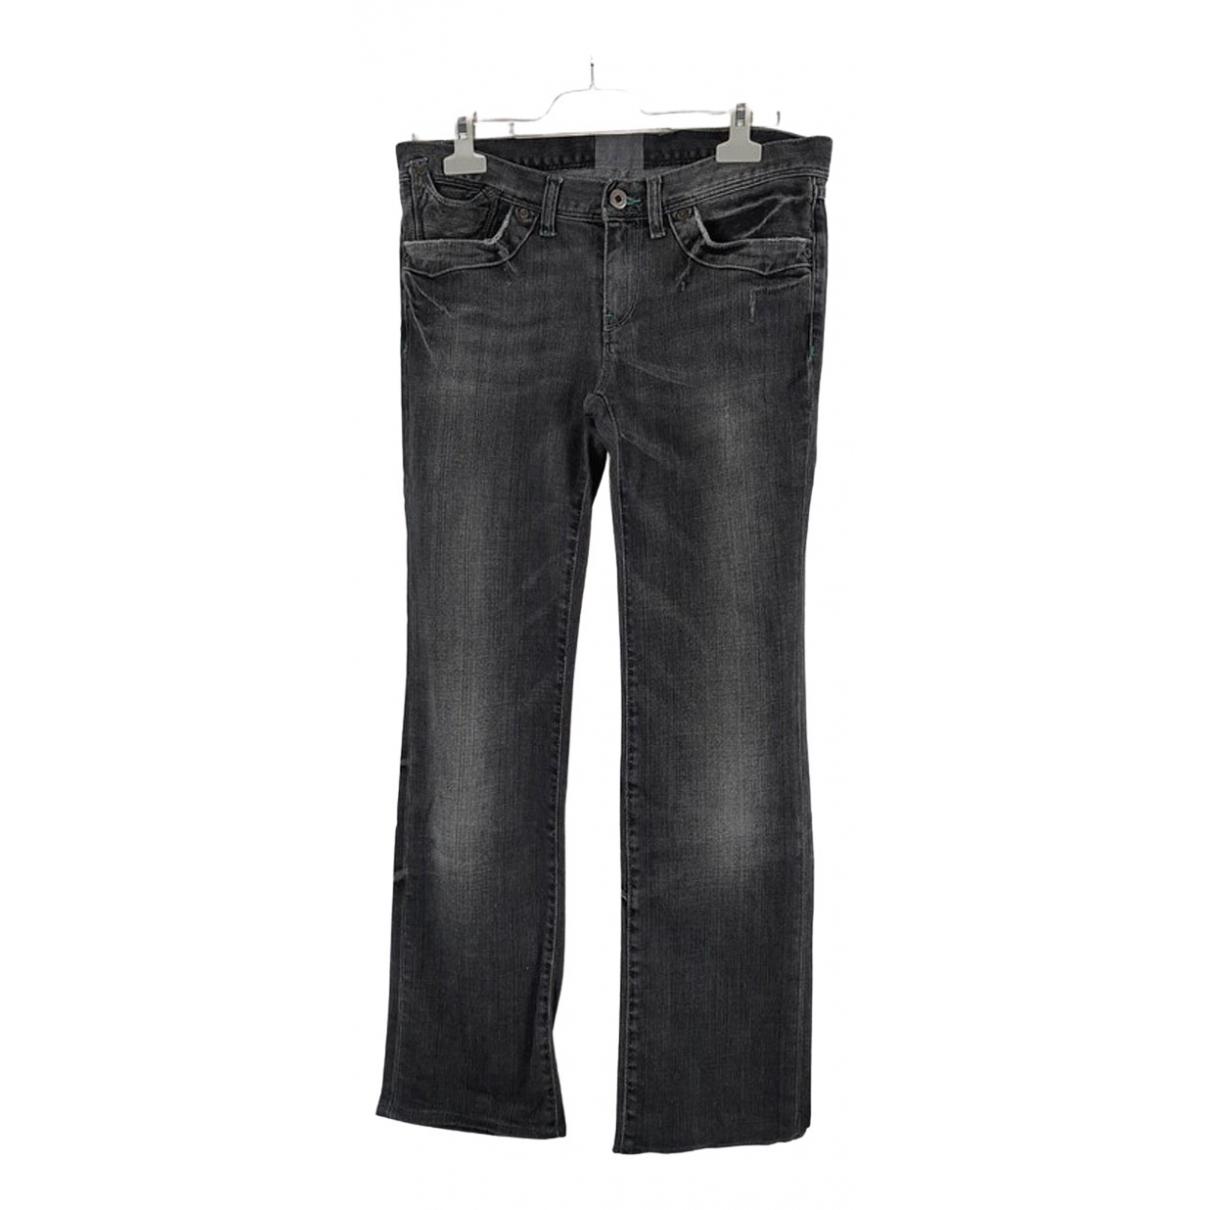 Polo Ralph Lauren \N Grey Cotton - elasthane Jeans for Women 39 FR